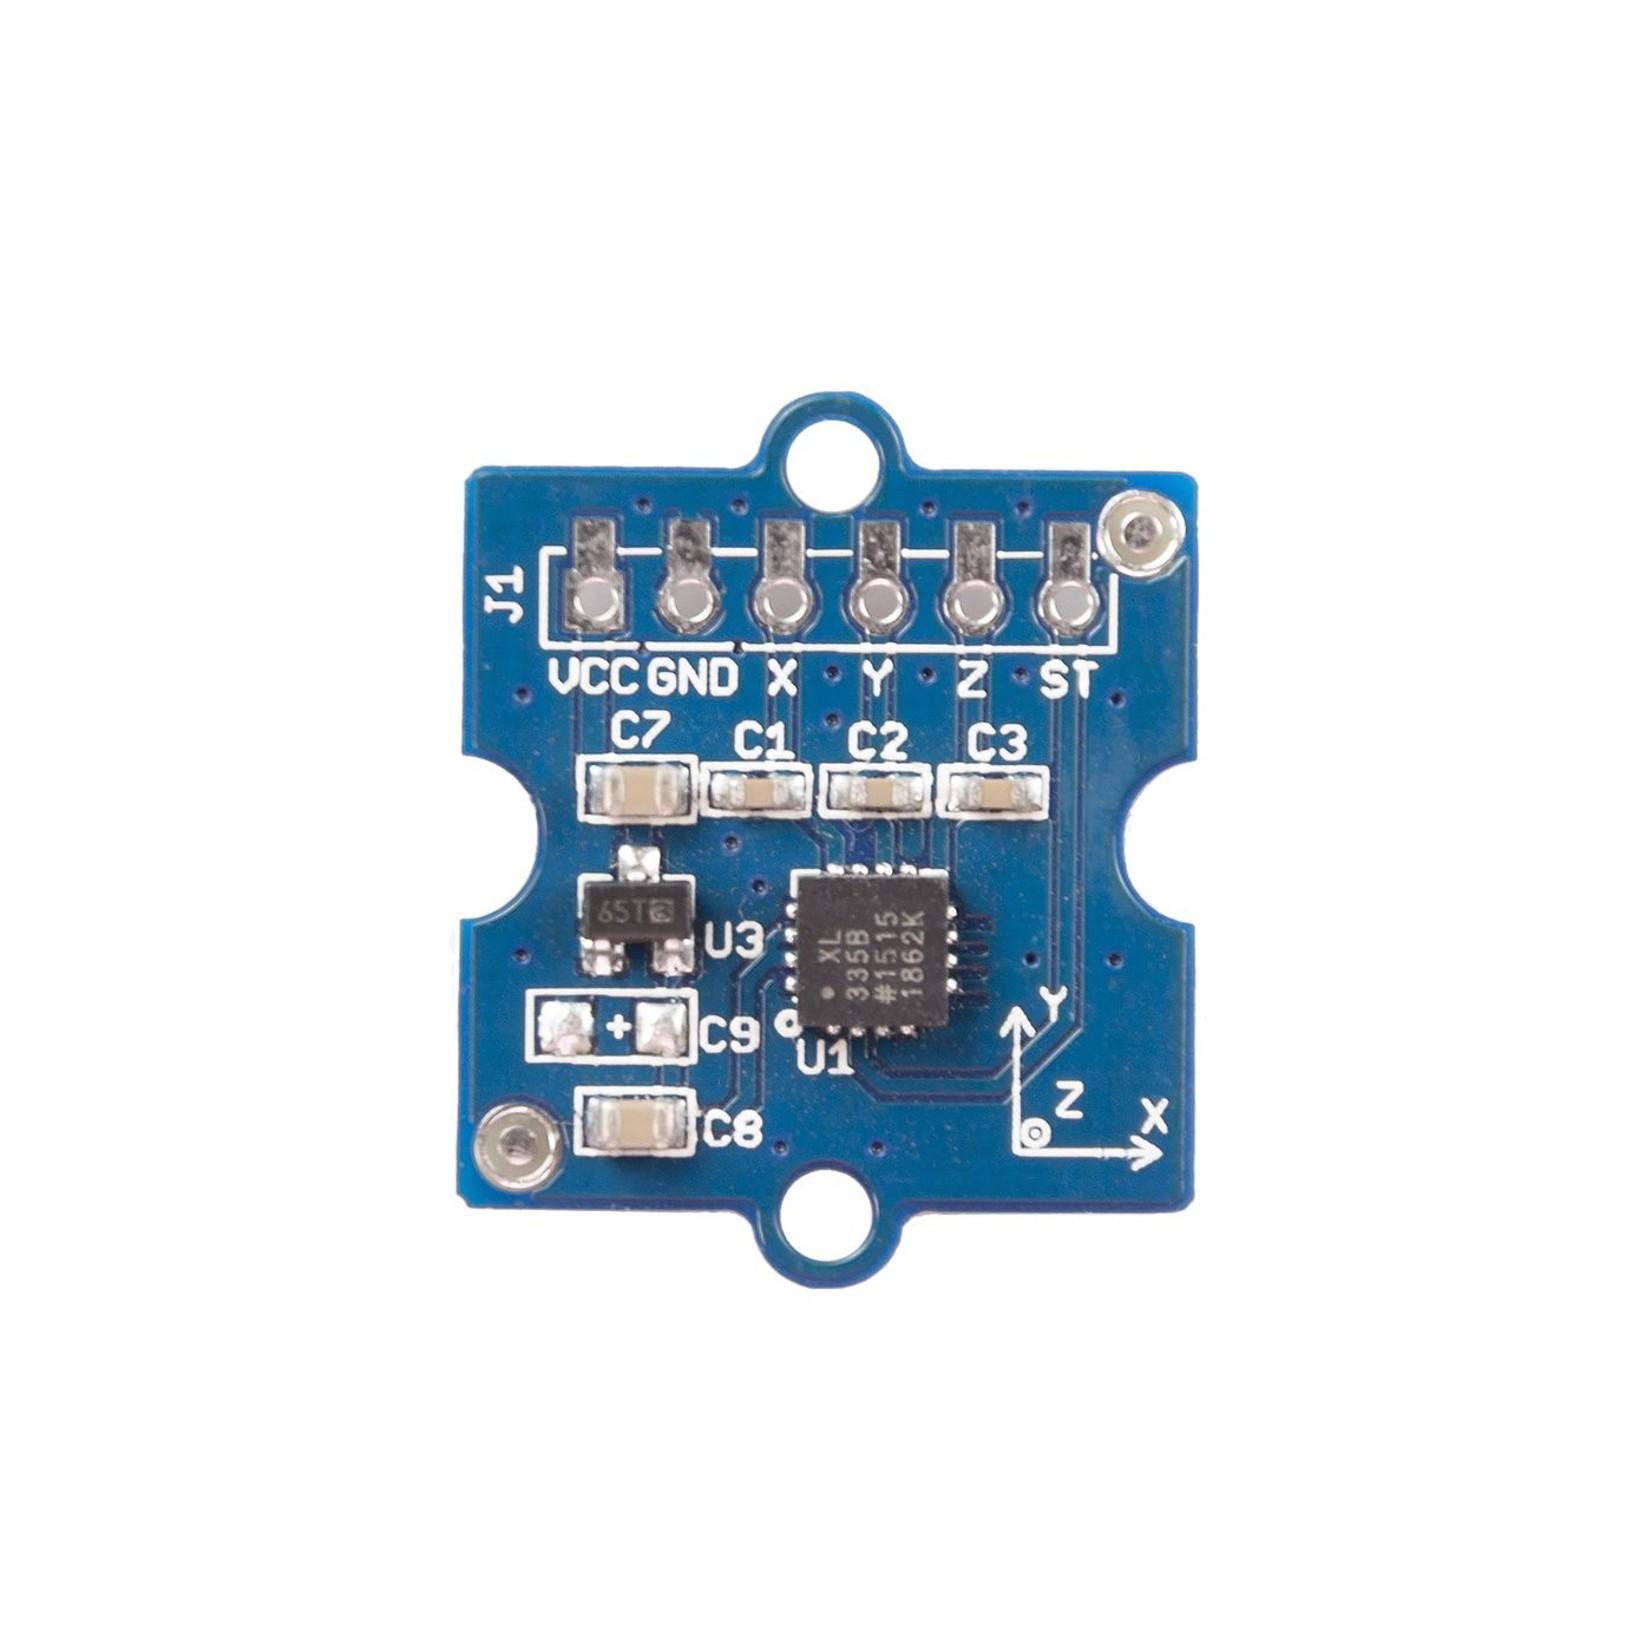 Seeed Grove - 3-Axis Analog Accelerometer